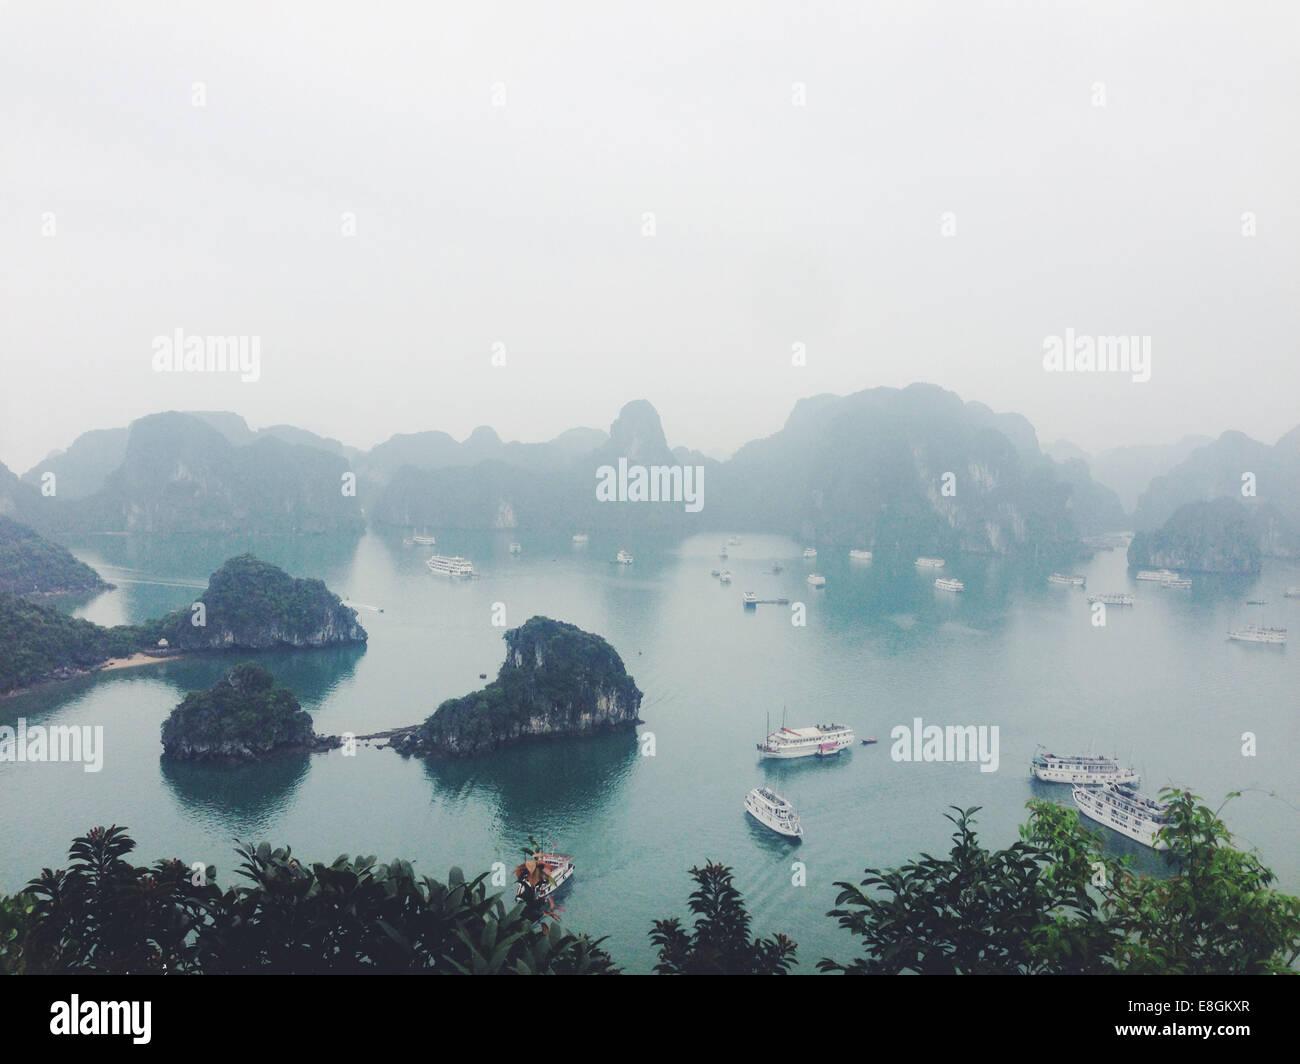 Vietnam, Quang Ninh Province, Halong, HaLong Bay, Elevated view of foggy bay - Stock Image